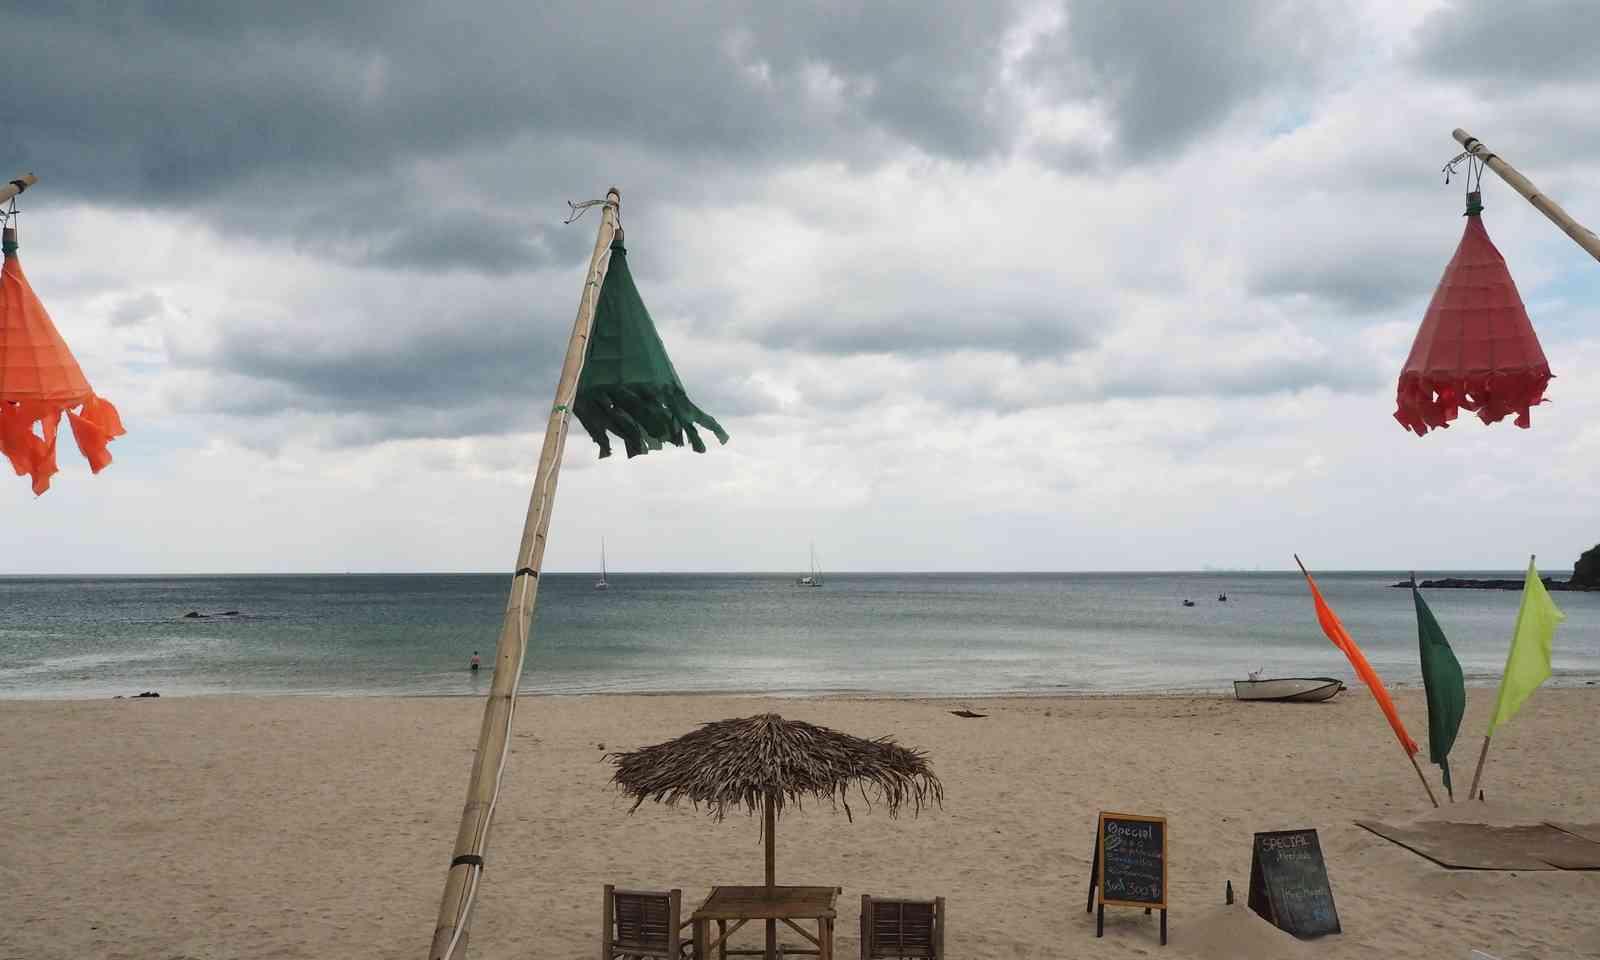 Keeping an eye on the sea (Liz Cleere)